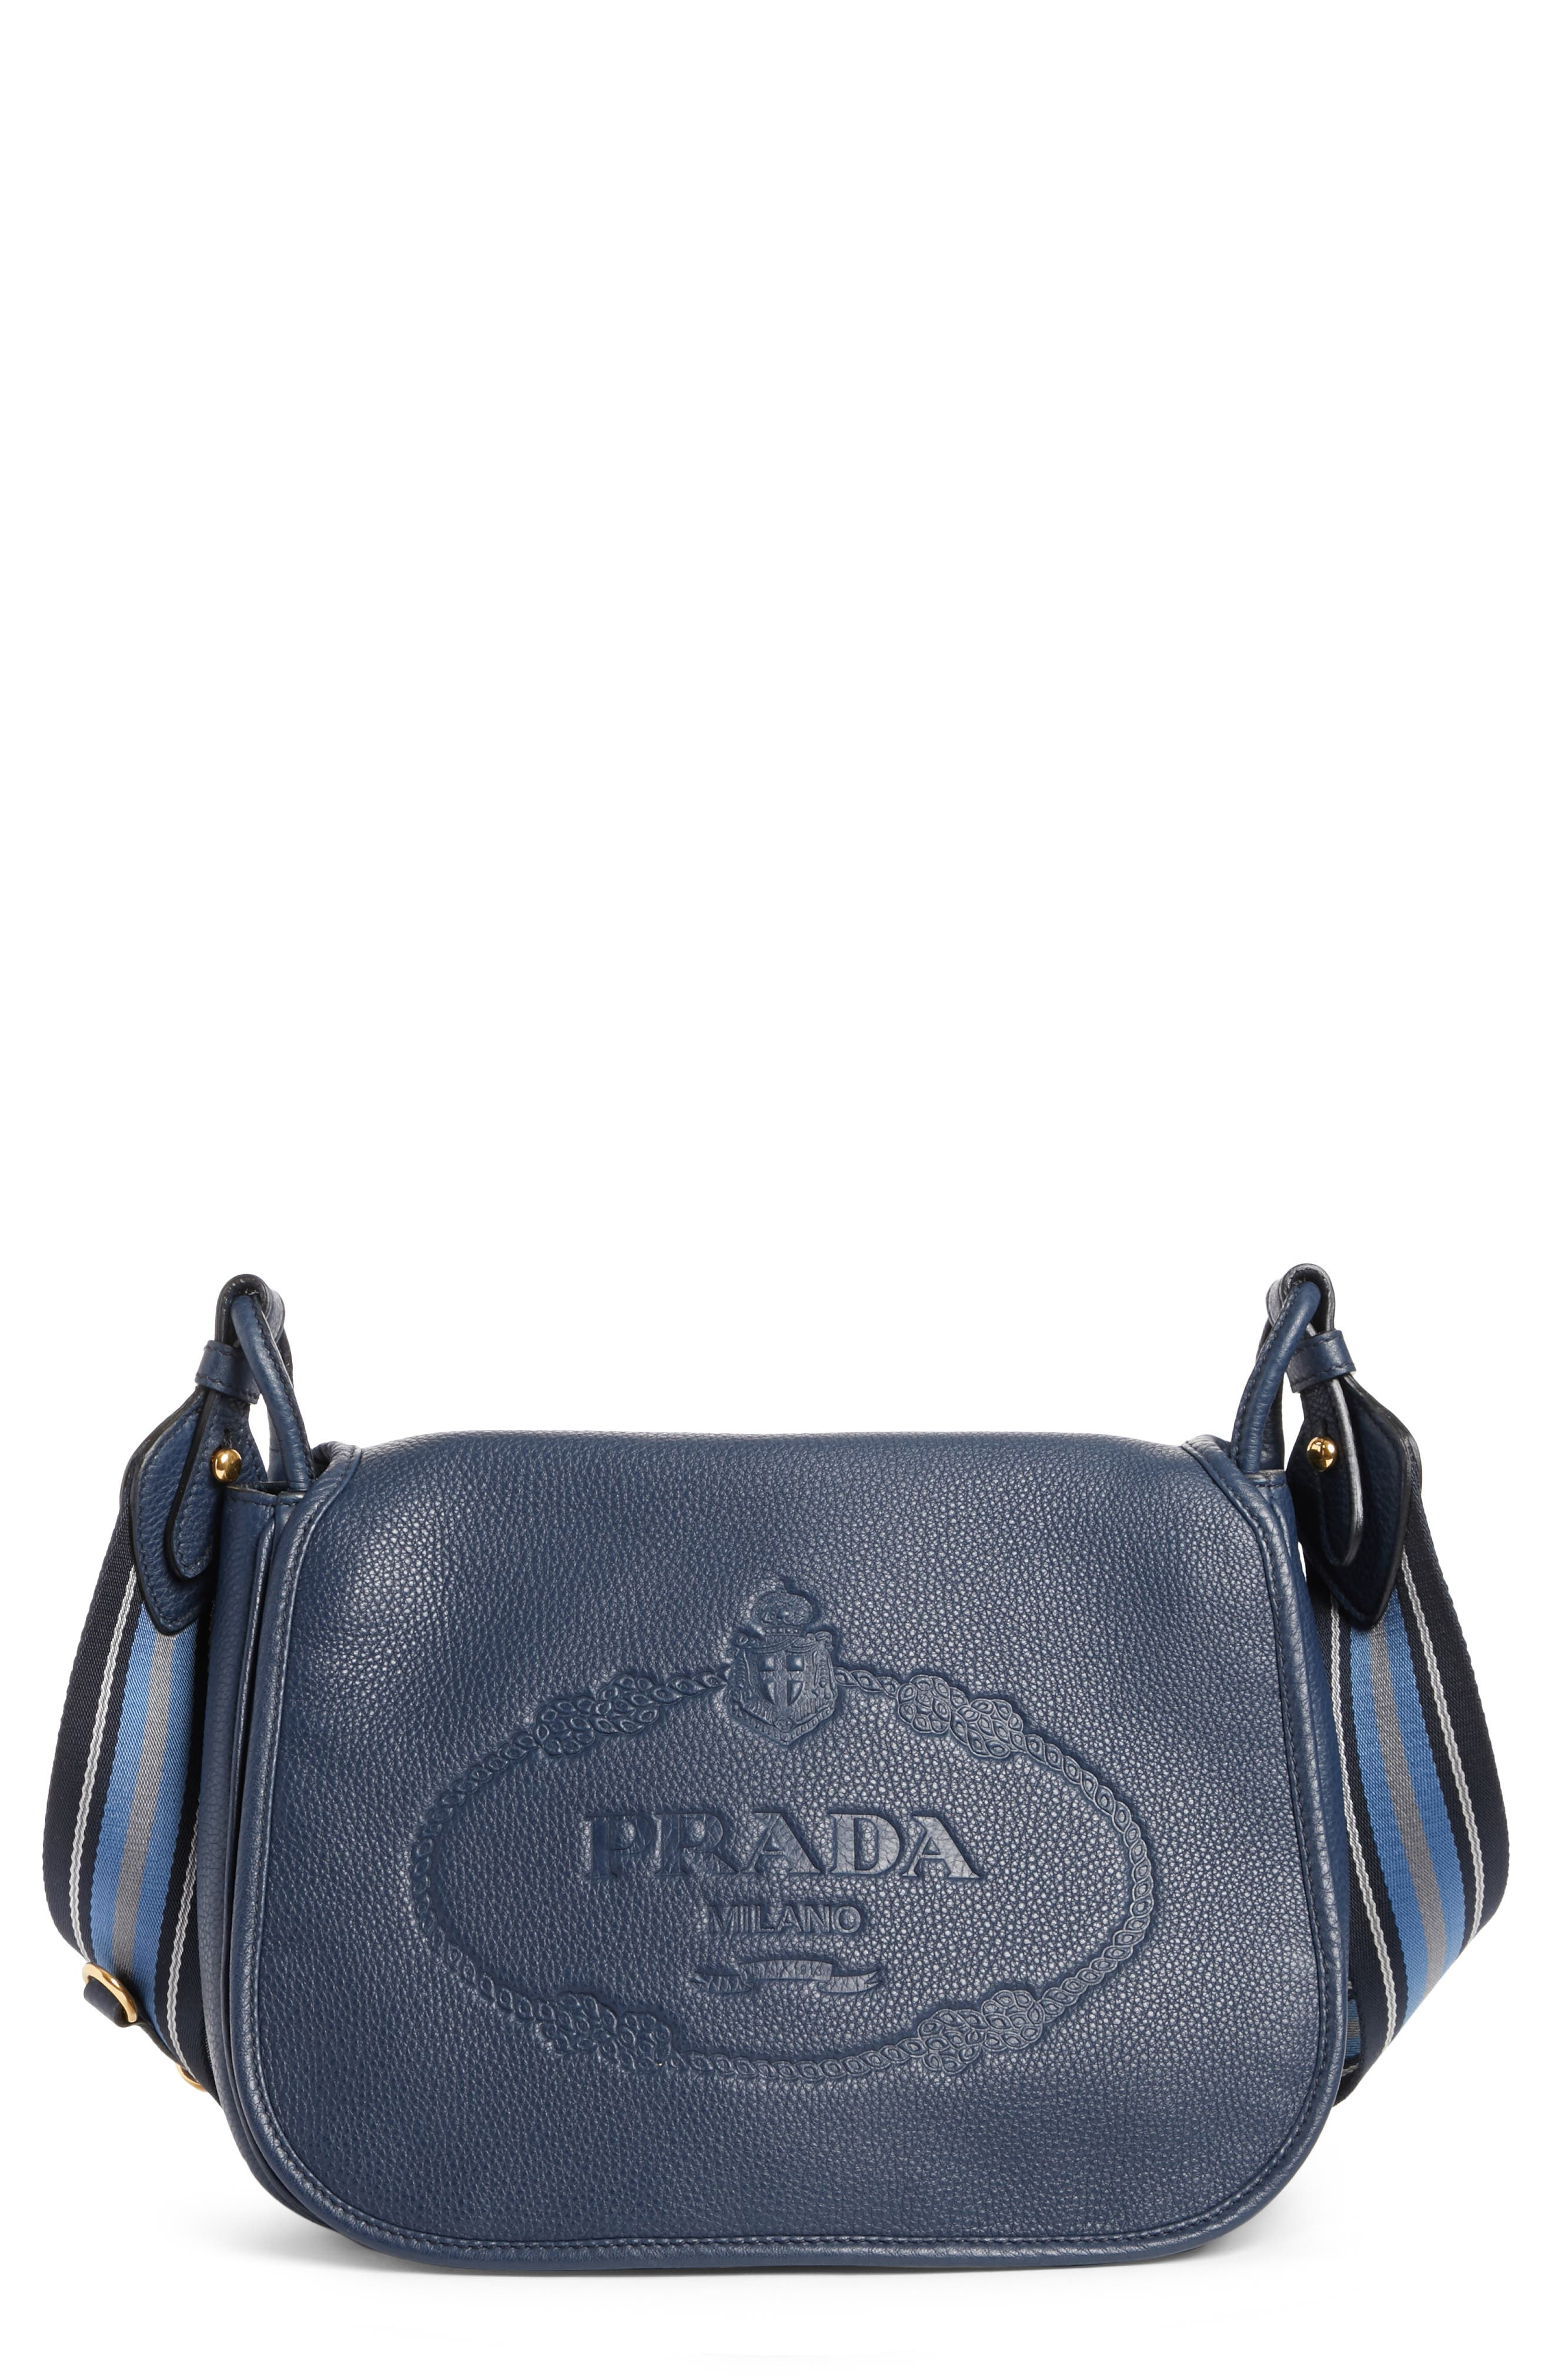 Vitello Daino Heritage Logo Leather Crossbody Bag,                             Main thumbnail 2, color,